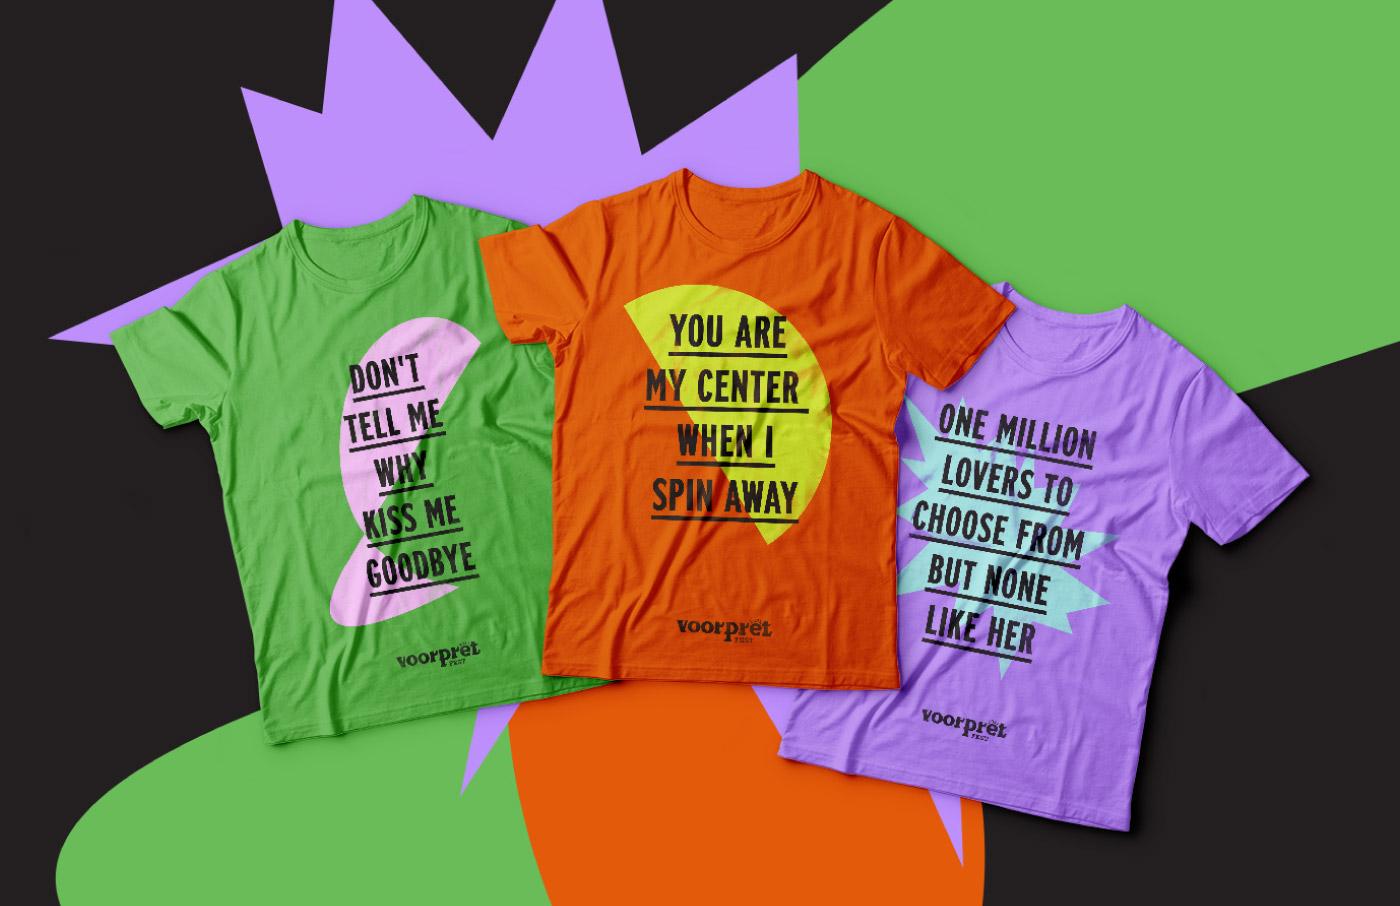 music festival concert logo design visual identity colors shirts merchandise lyrics